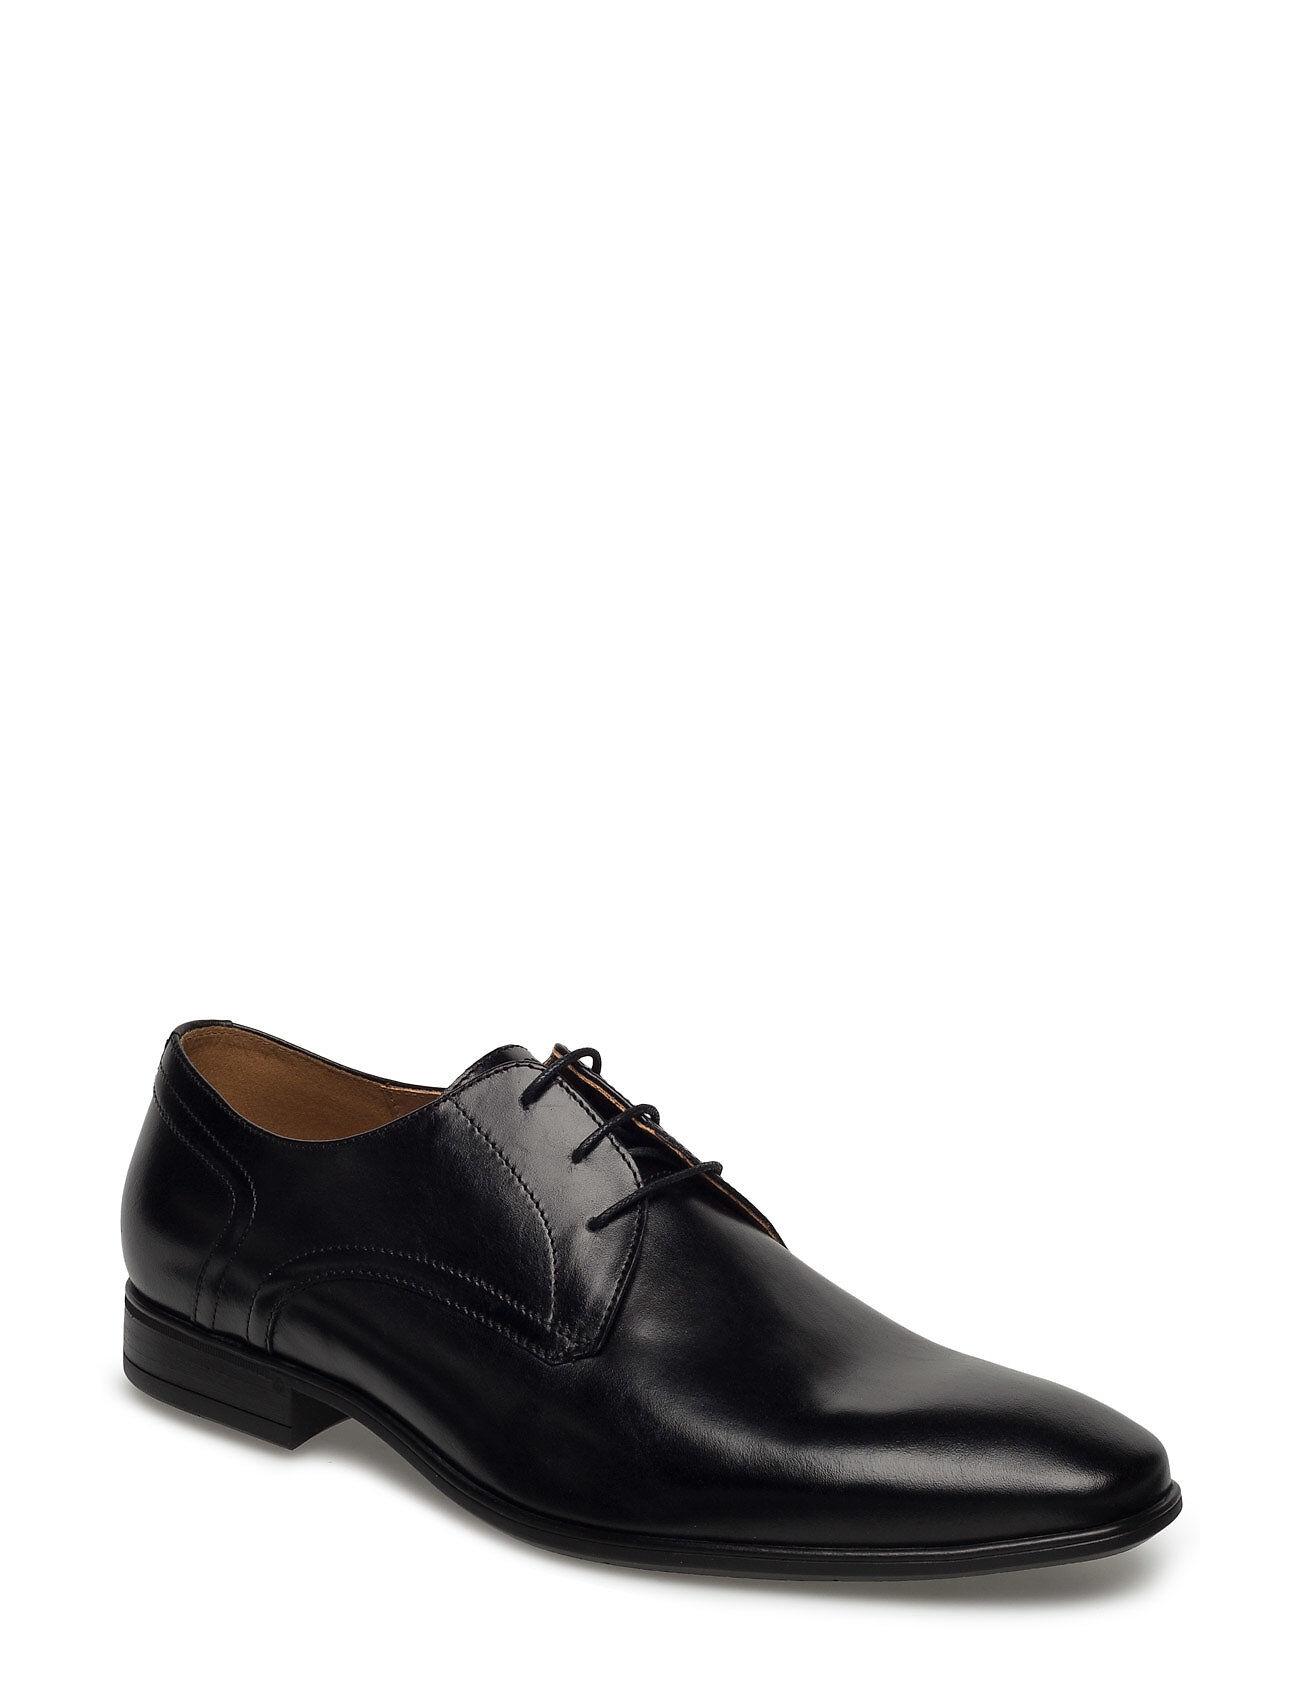 Playboy Footwear 7408 Shoes Business Laced Shoes Musta Playboy Footwear